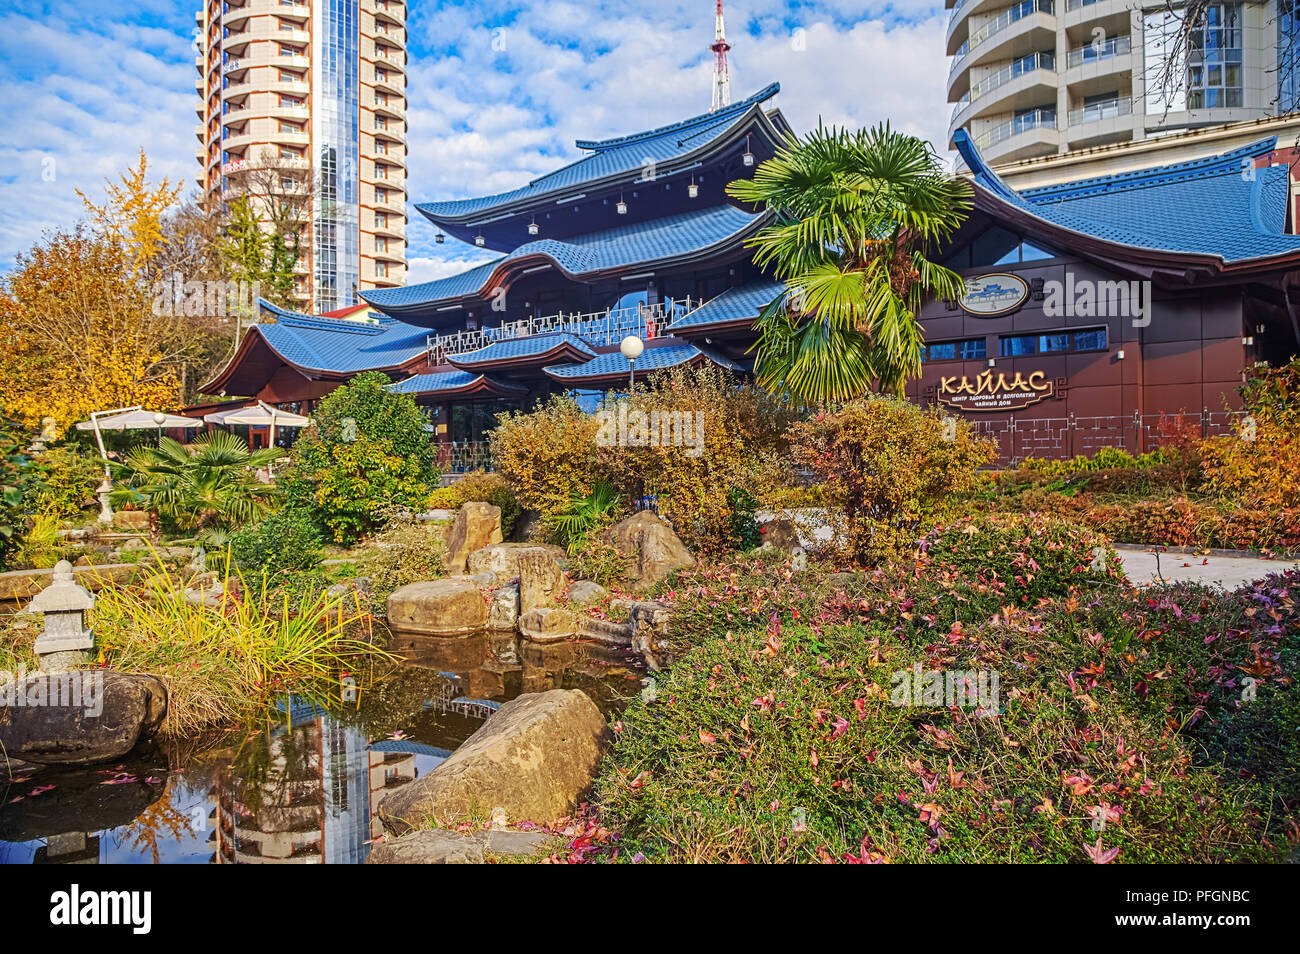 Japanese Friendship Garden Stock Photos & Japanese Friendship Garden ...